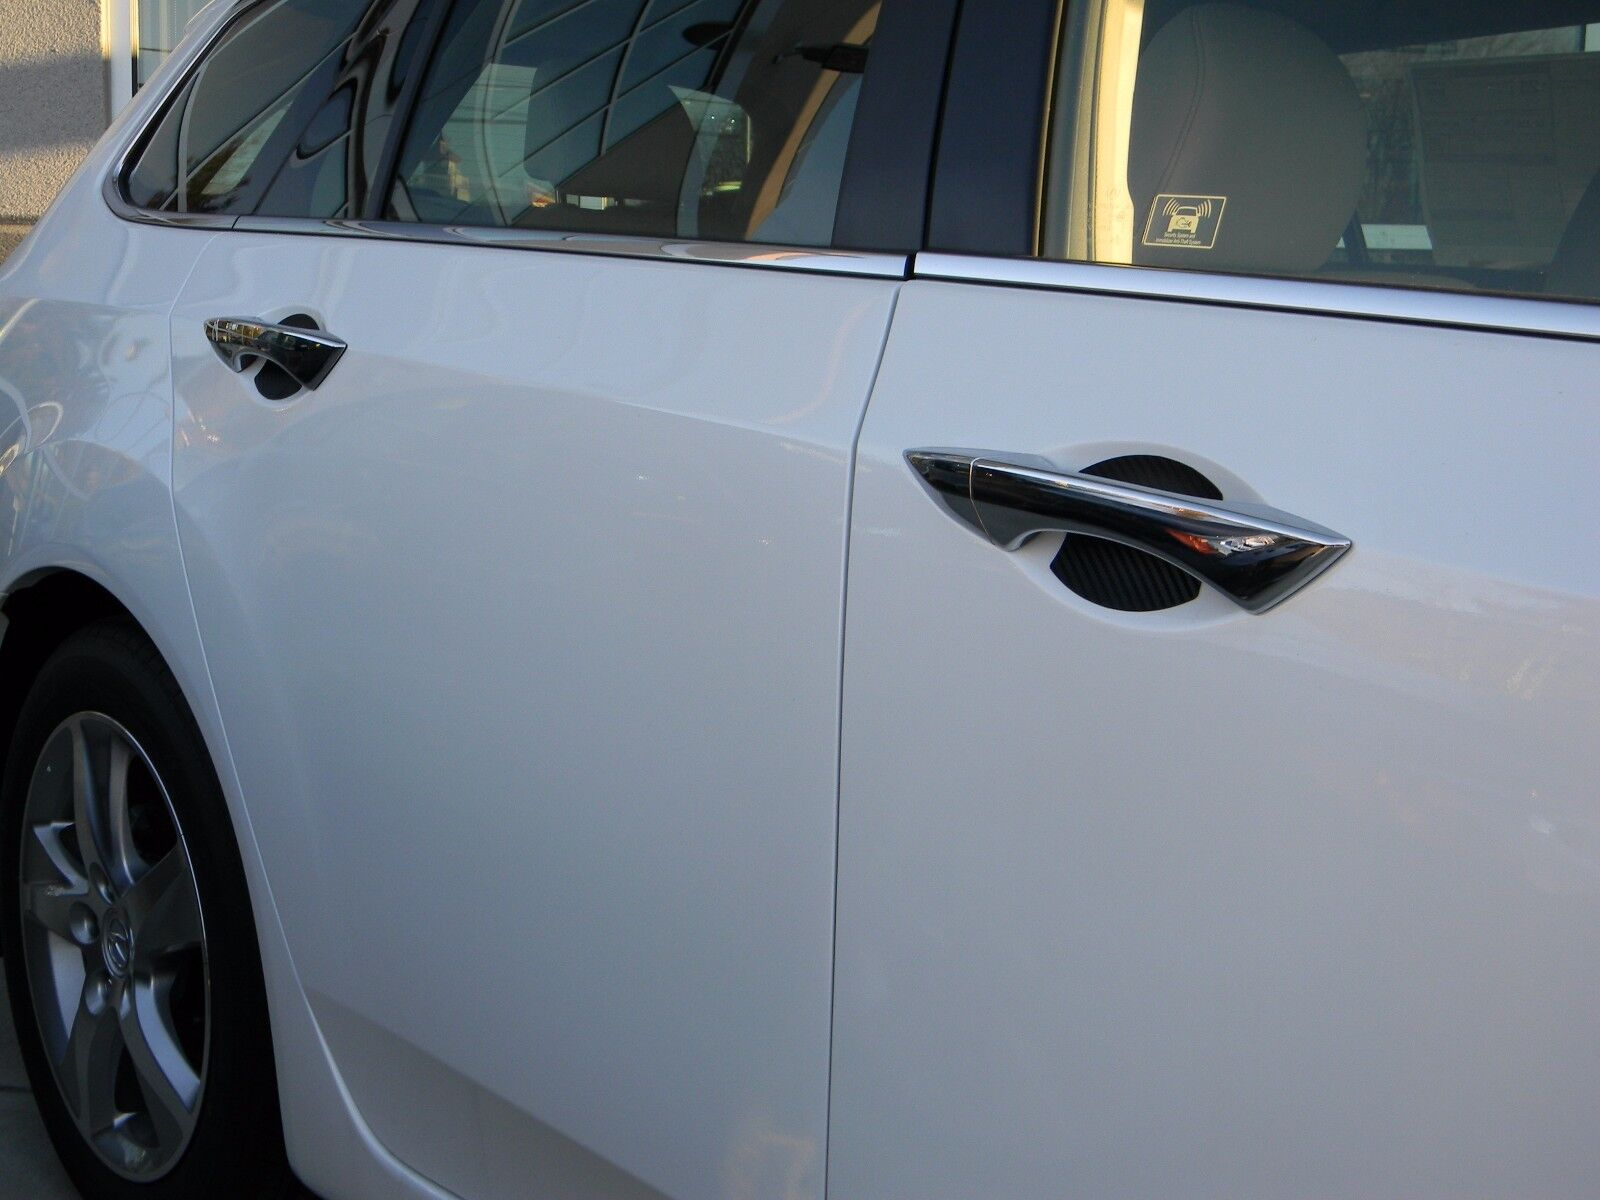 Set of 4X Recessed Door Handle Film Protector Stickers kwmobile TPU Cover for Car Door Handle Matte Transparent